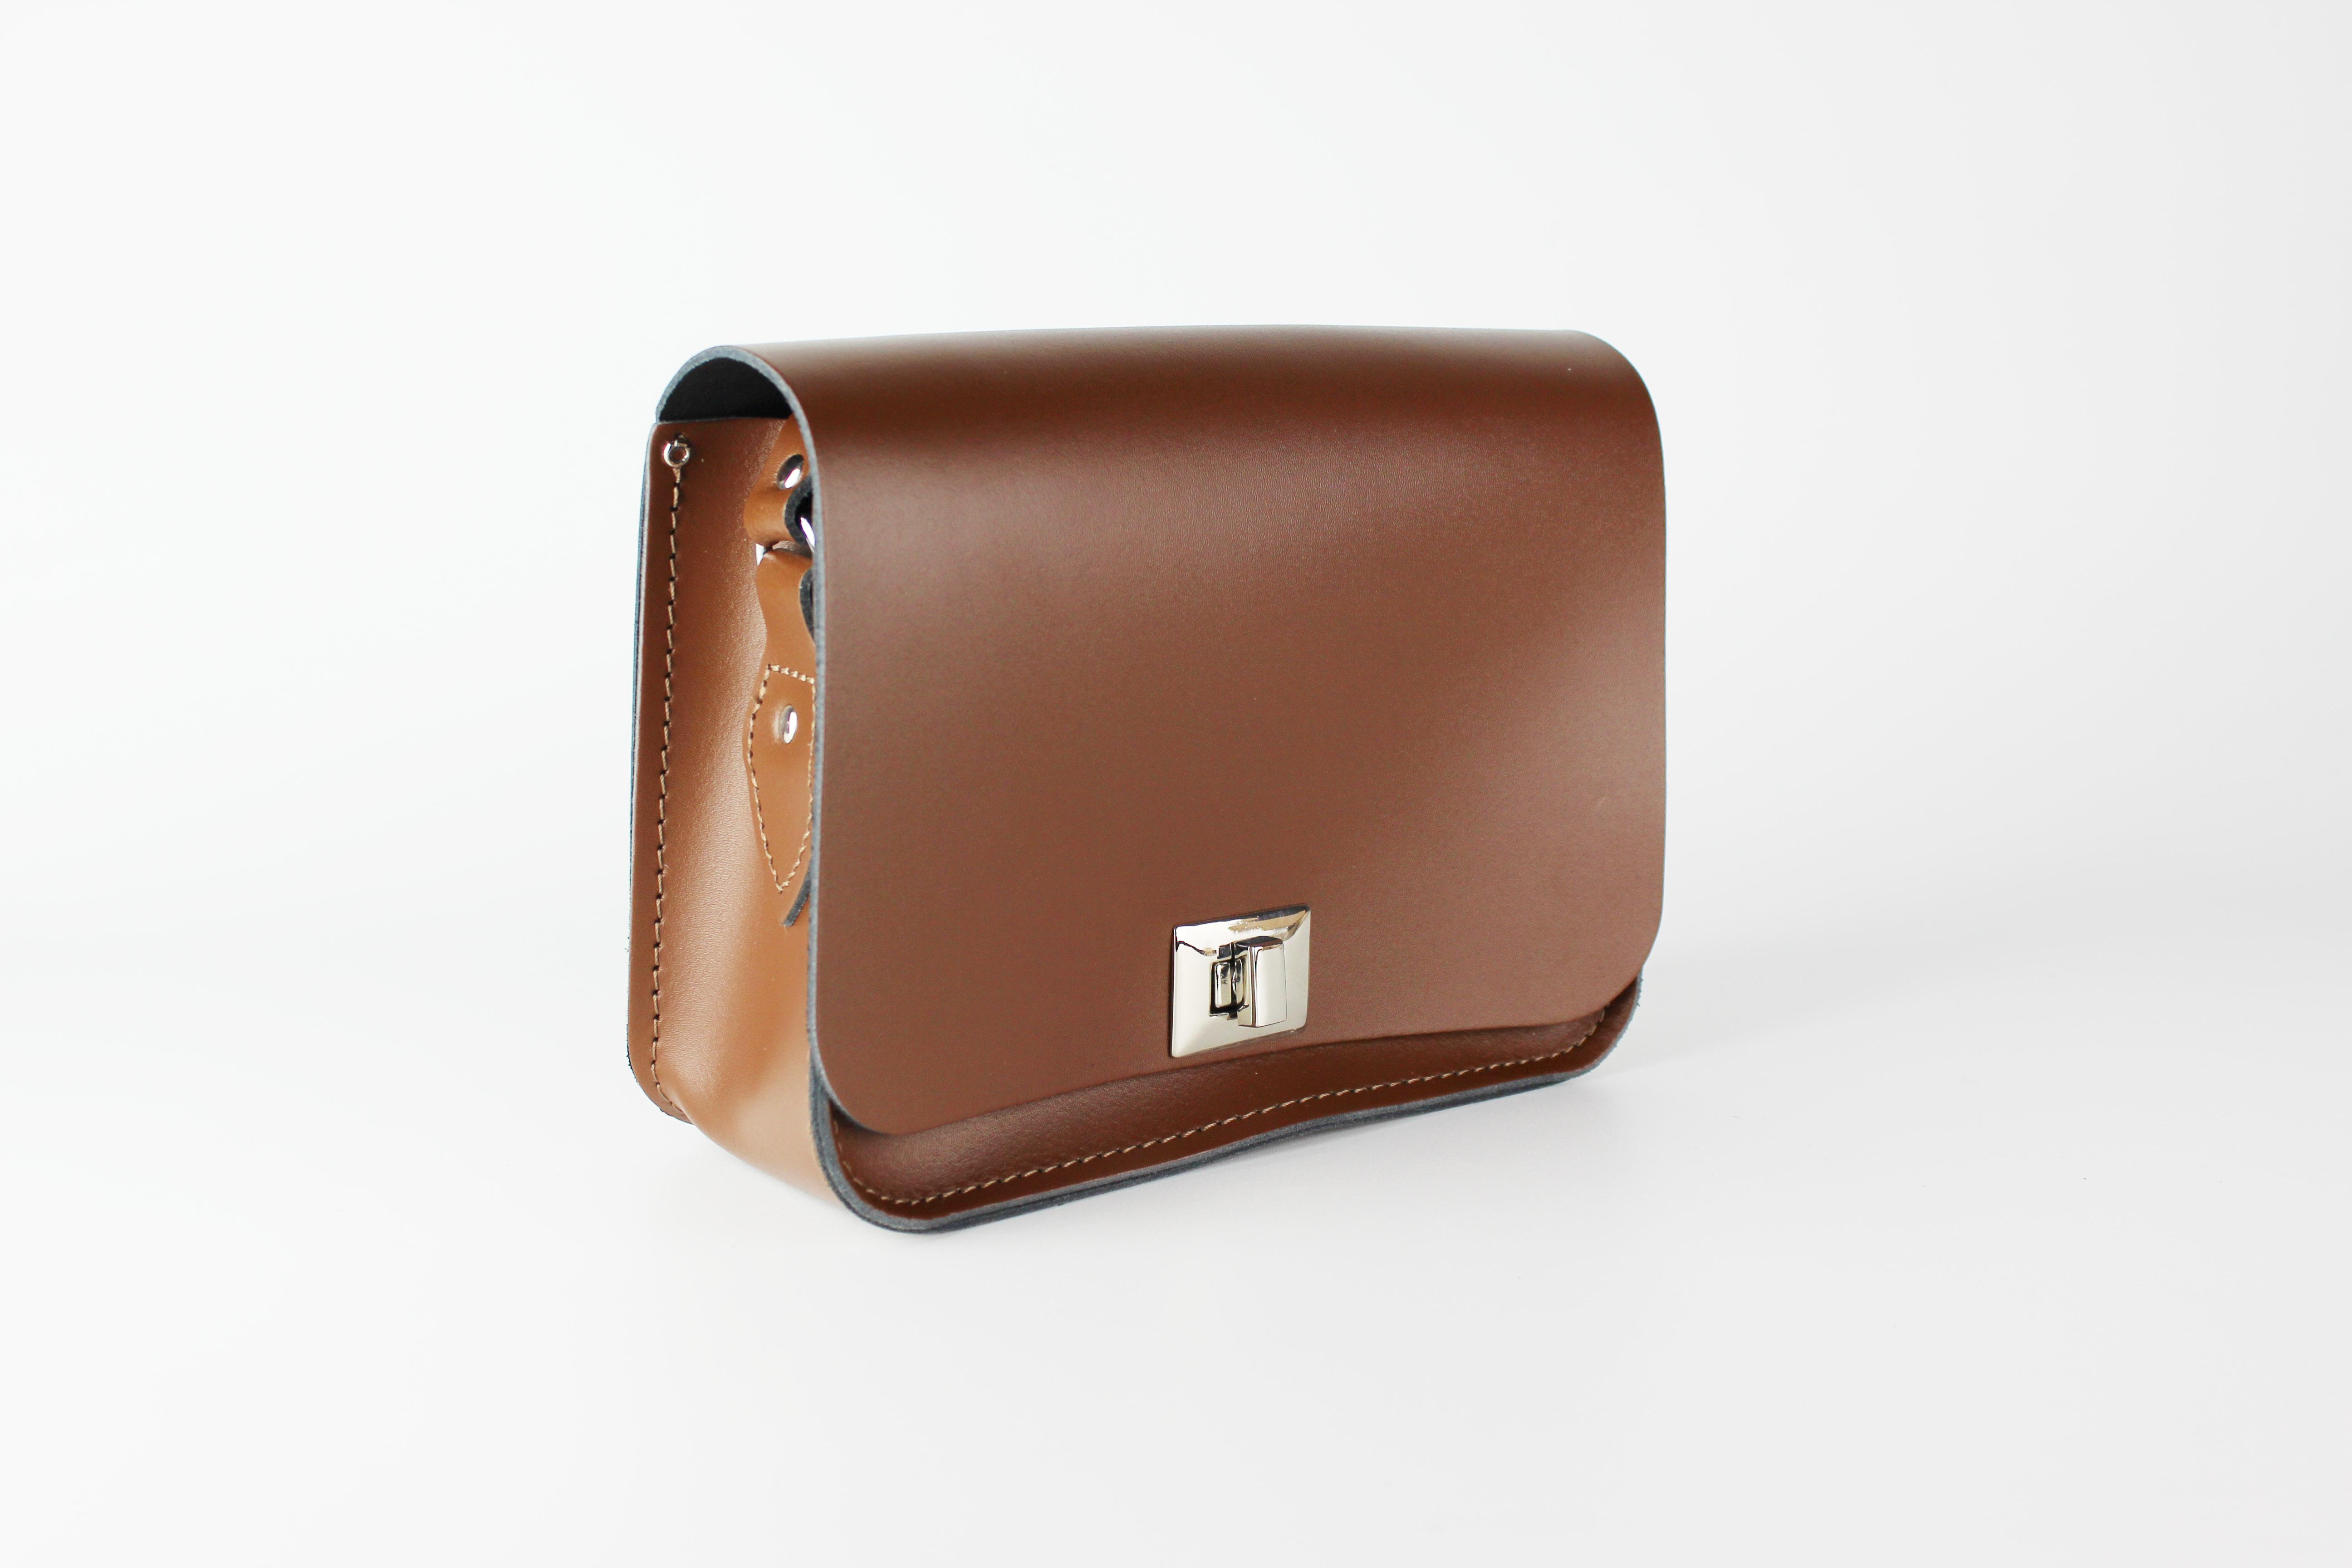 Chestnut Brown Pixie Bag Medium | The Leather Satchel Co.